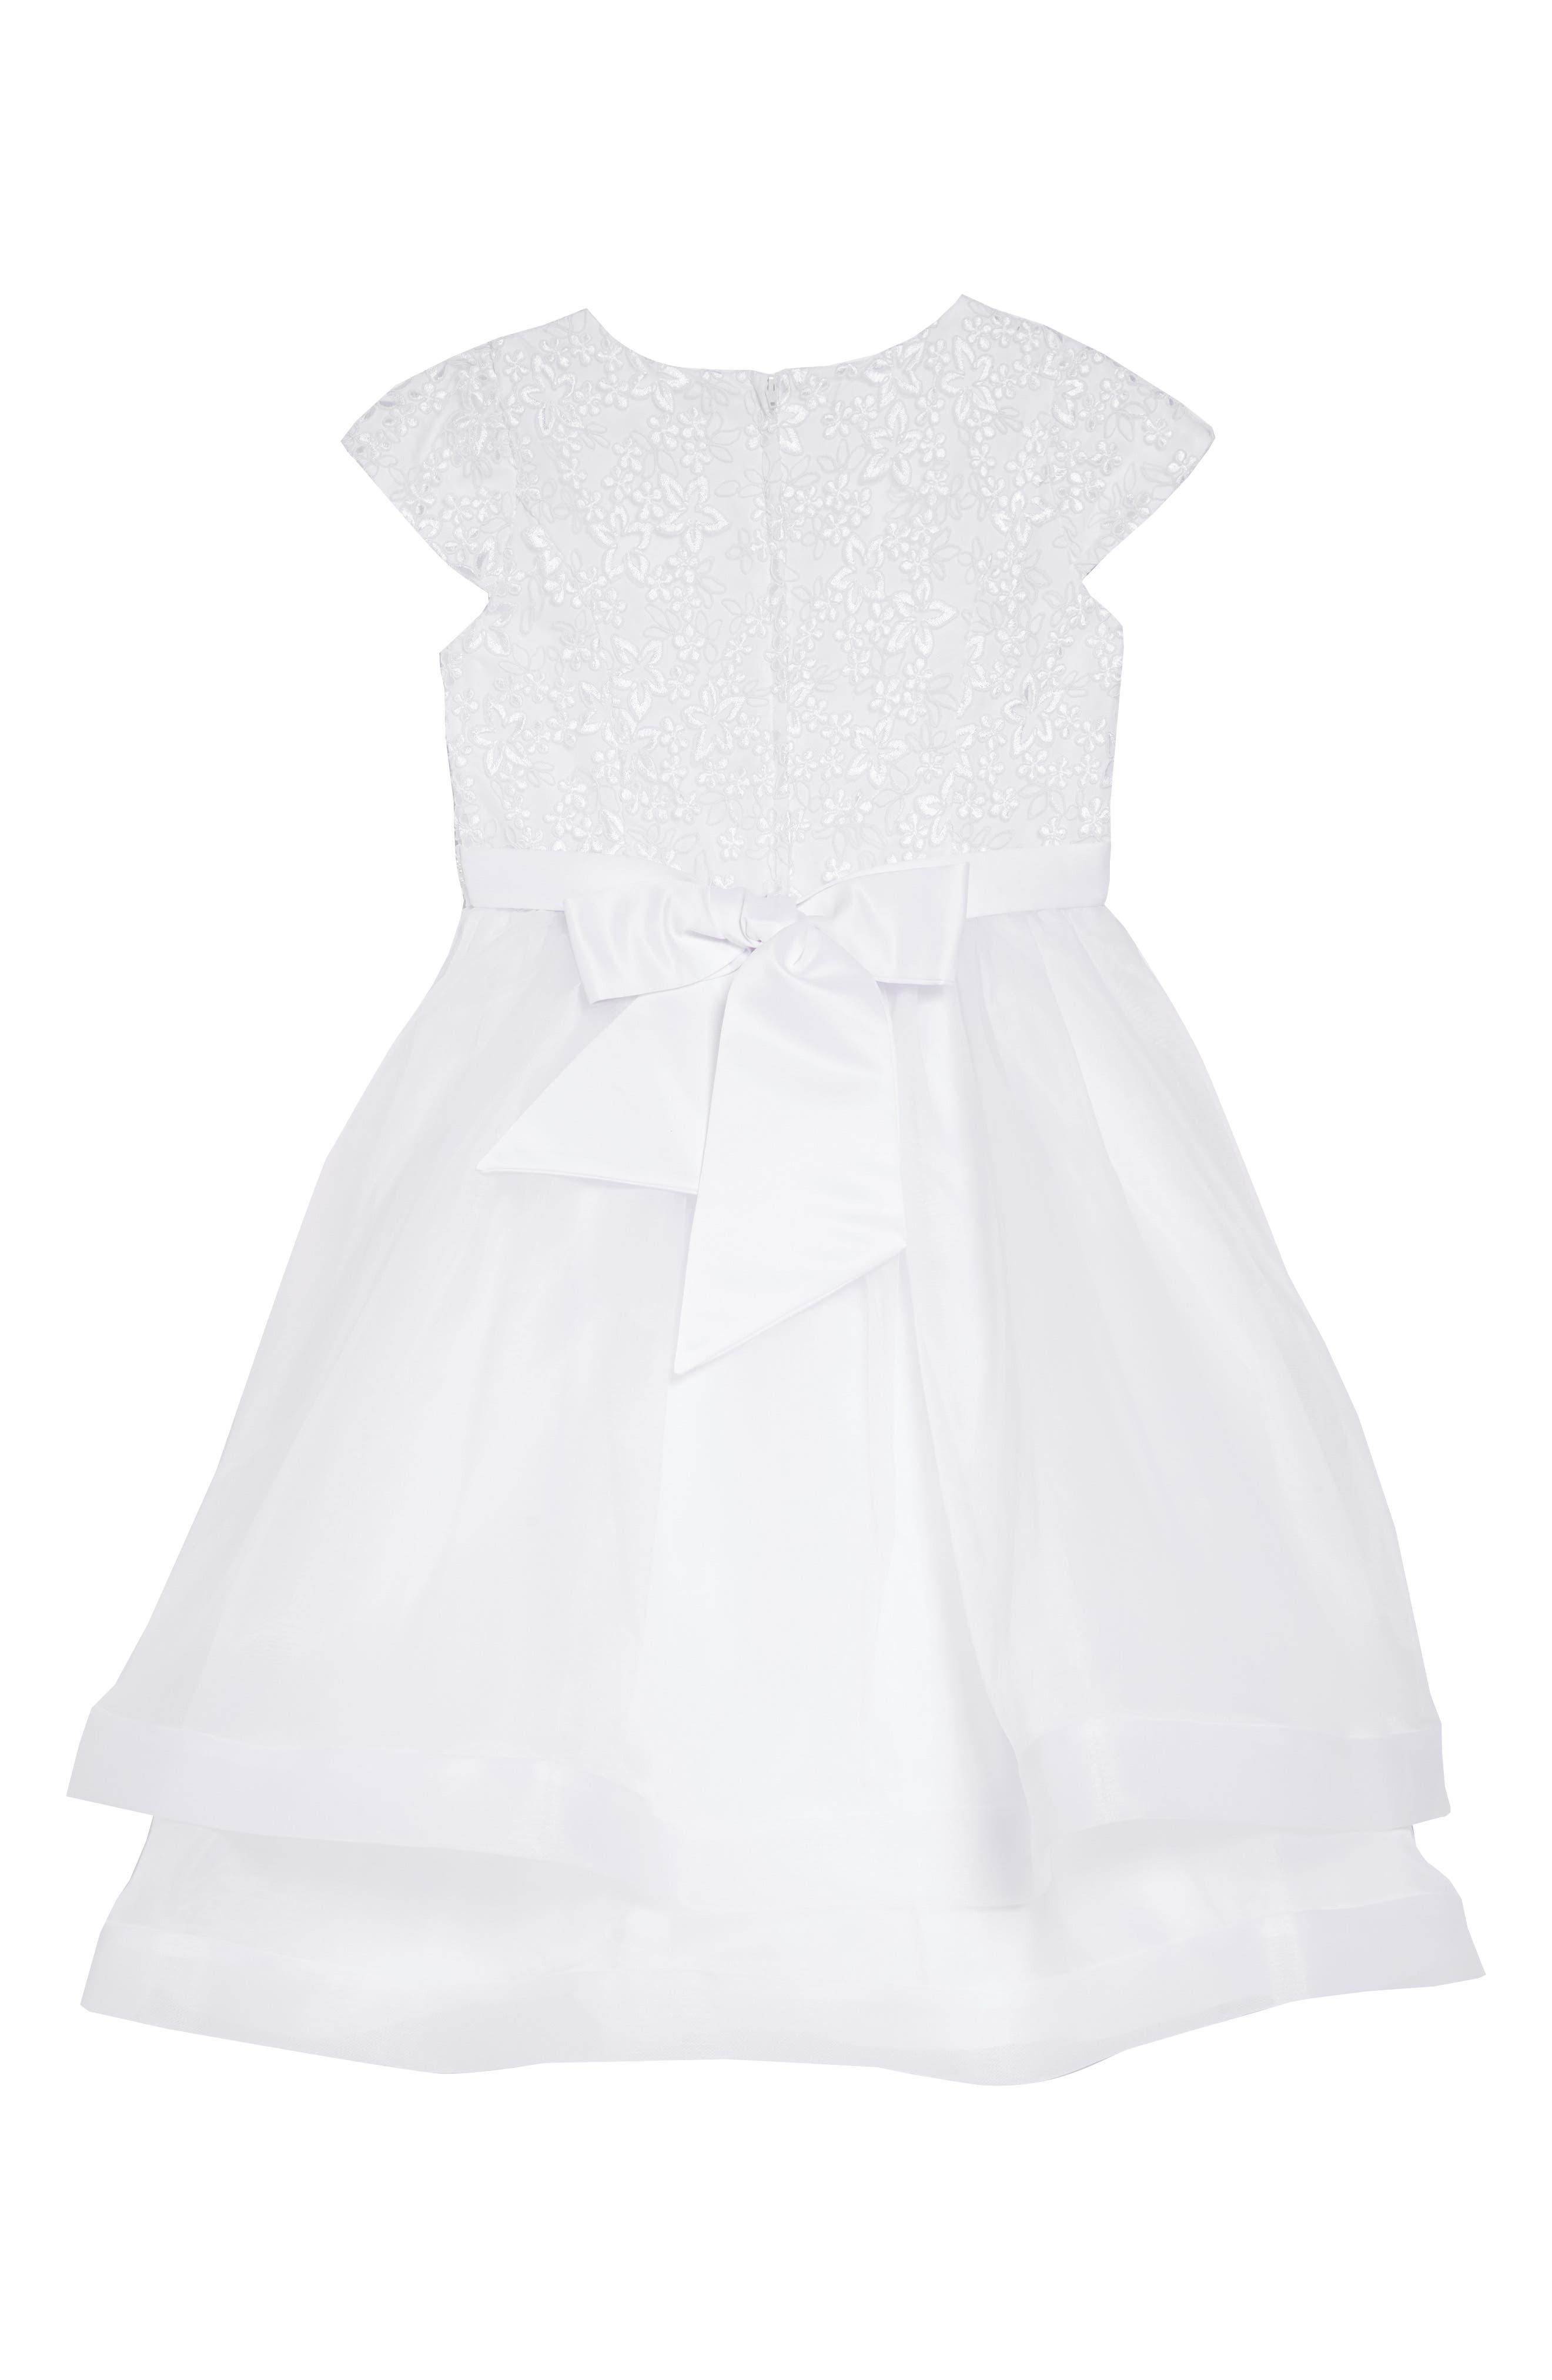 Sleeveless Embroidered & Beaded Communion Dress,                             Alternate thumbnail 2, color,                             WHITE